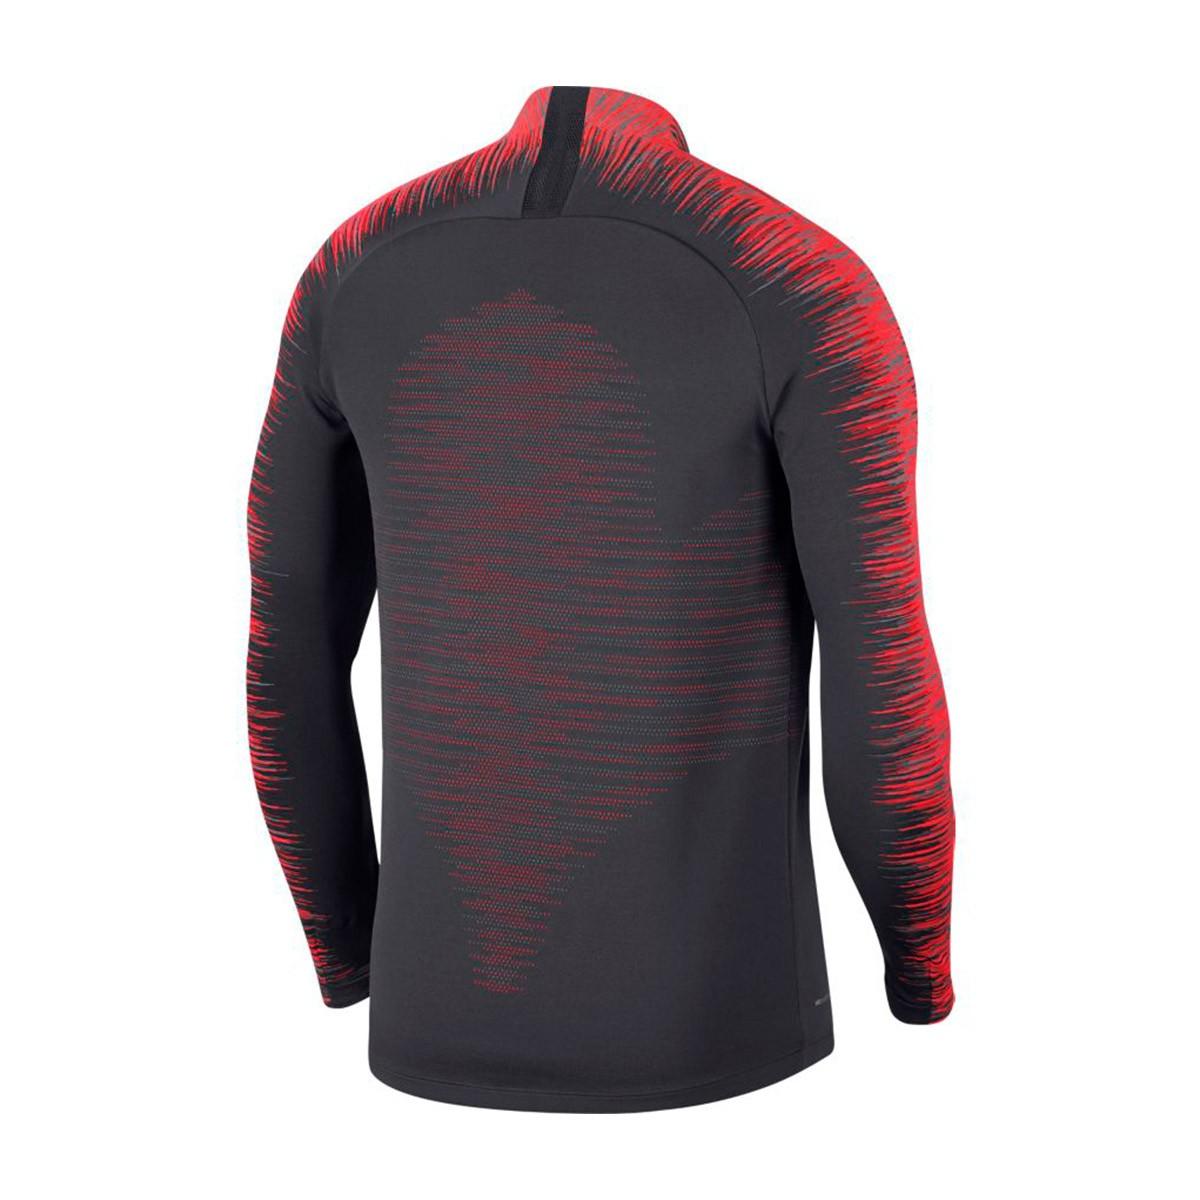 f993c3a11f34 Sweatshirt Nike VaporKnit Strike Dril Anthracite-Bright crimson ...